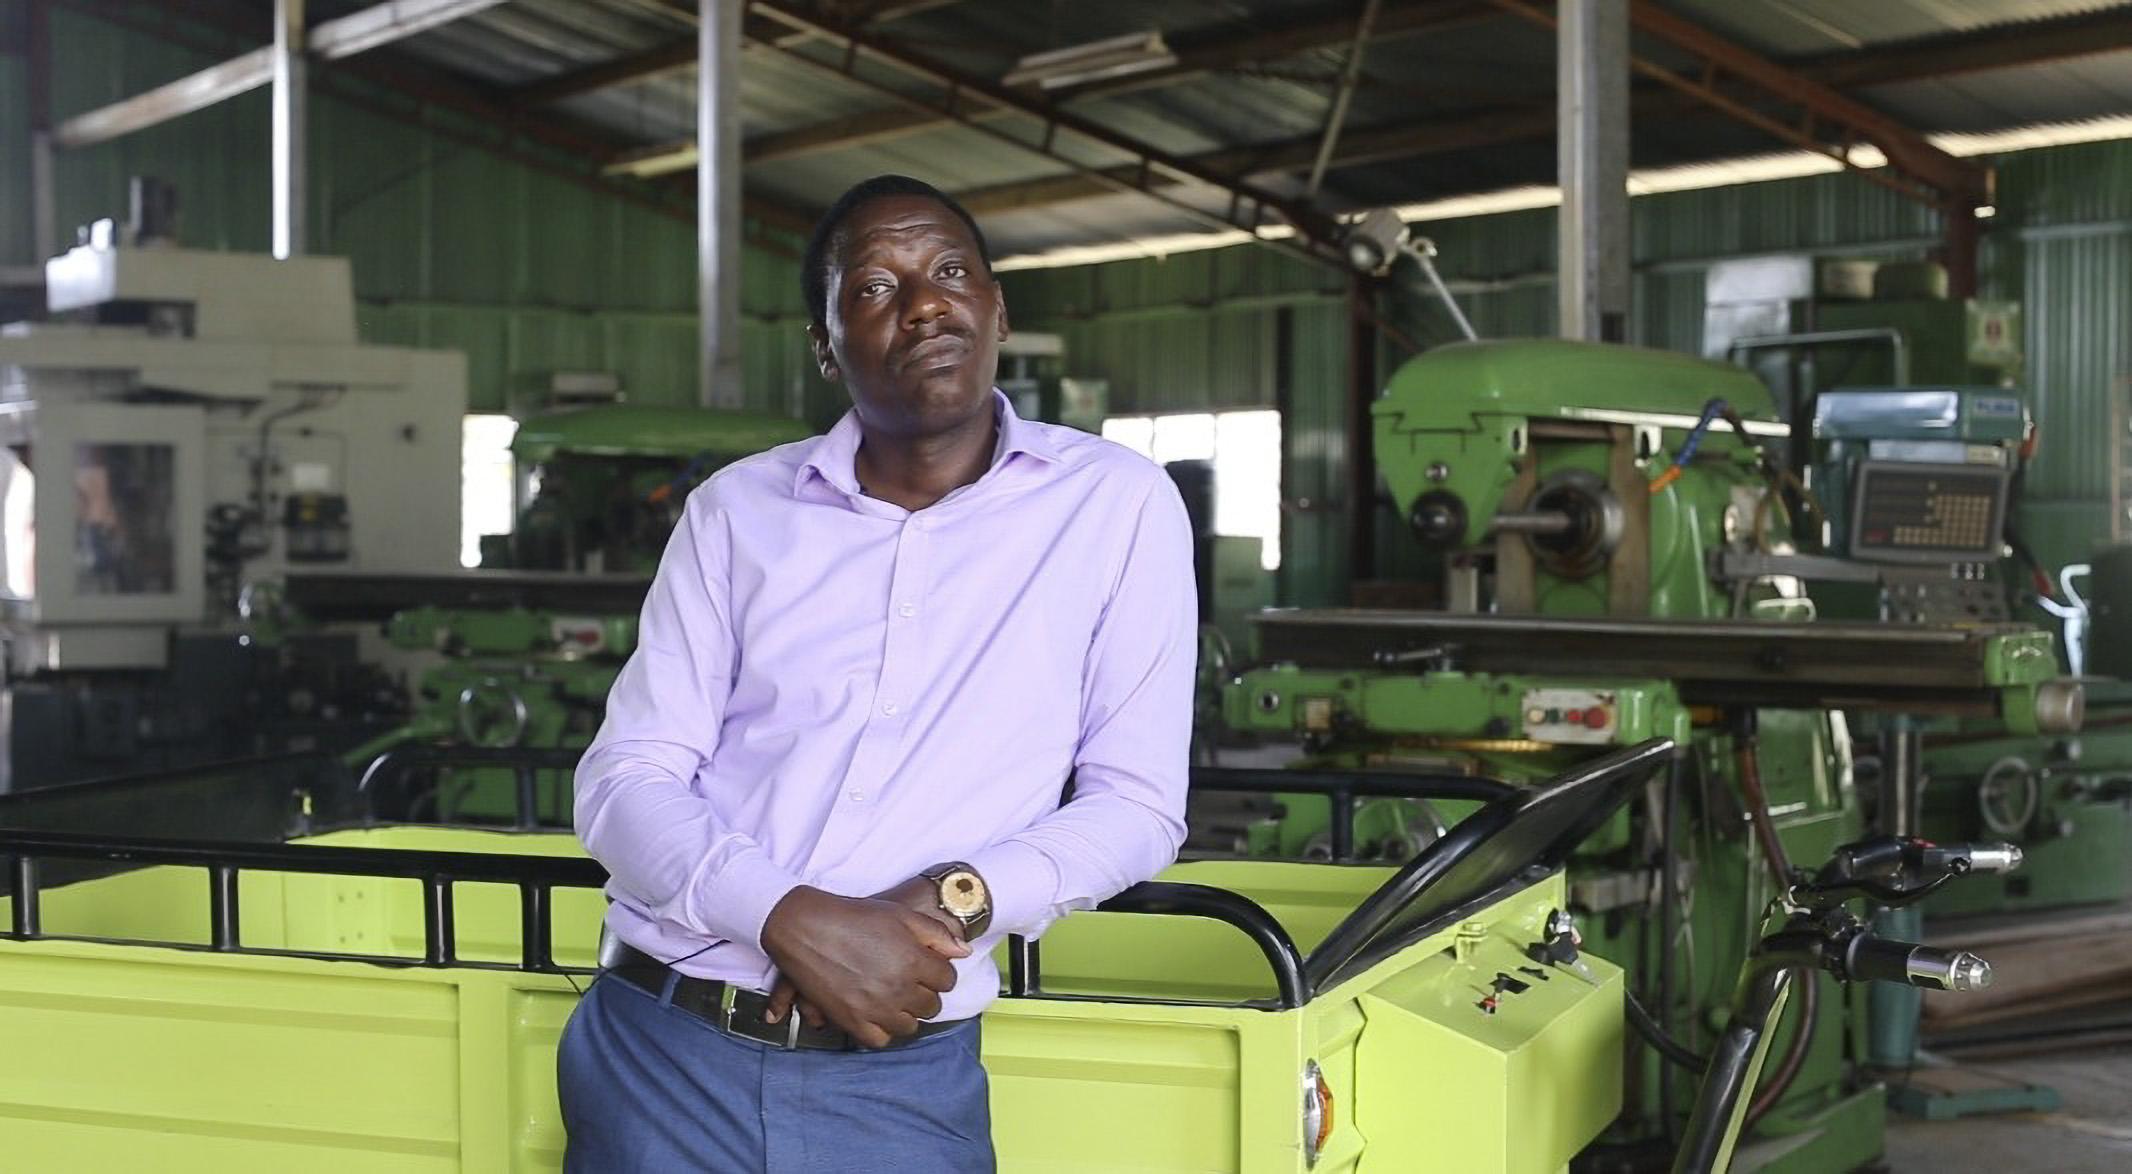 Kenyan Inventor Of Electric Handcarts, Auto Rickshaws Hopes To Go Global